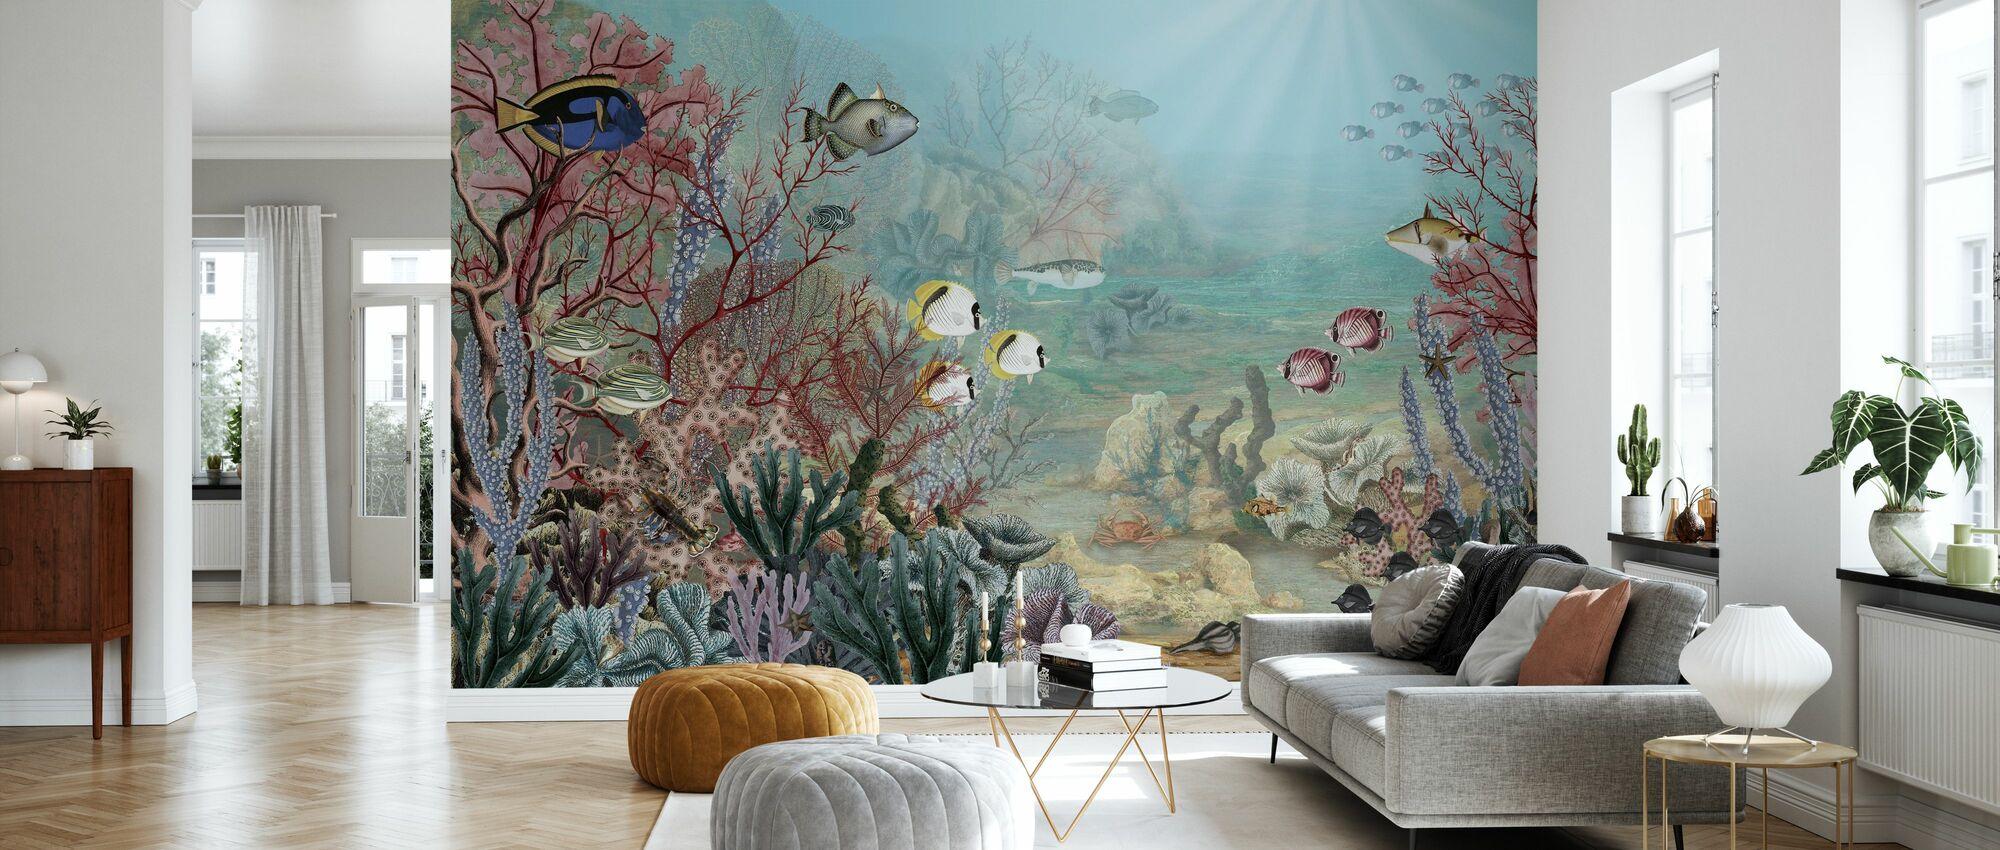 Coral Creatures - Wallpaper - Living Room